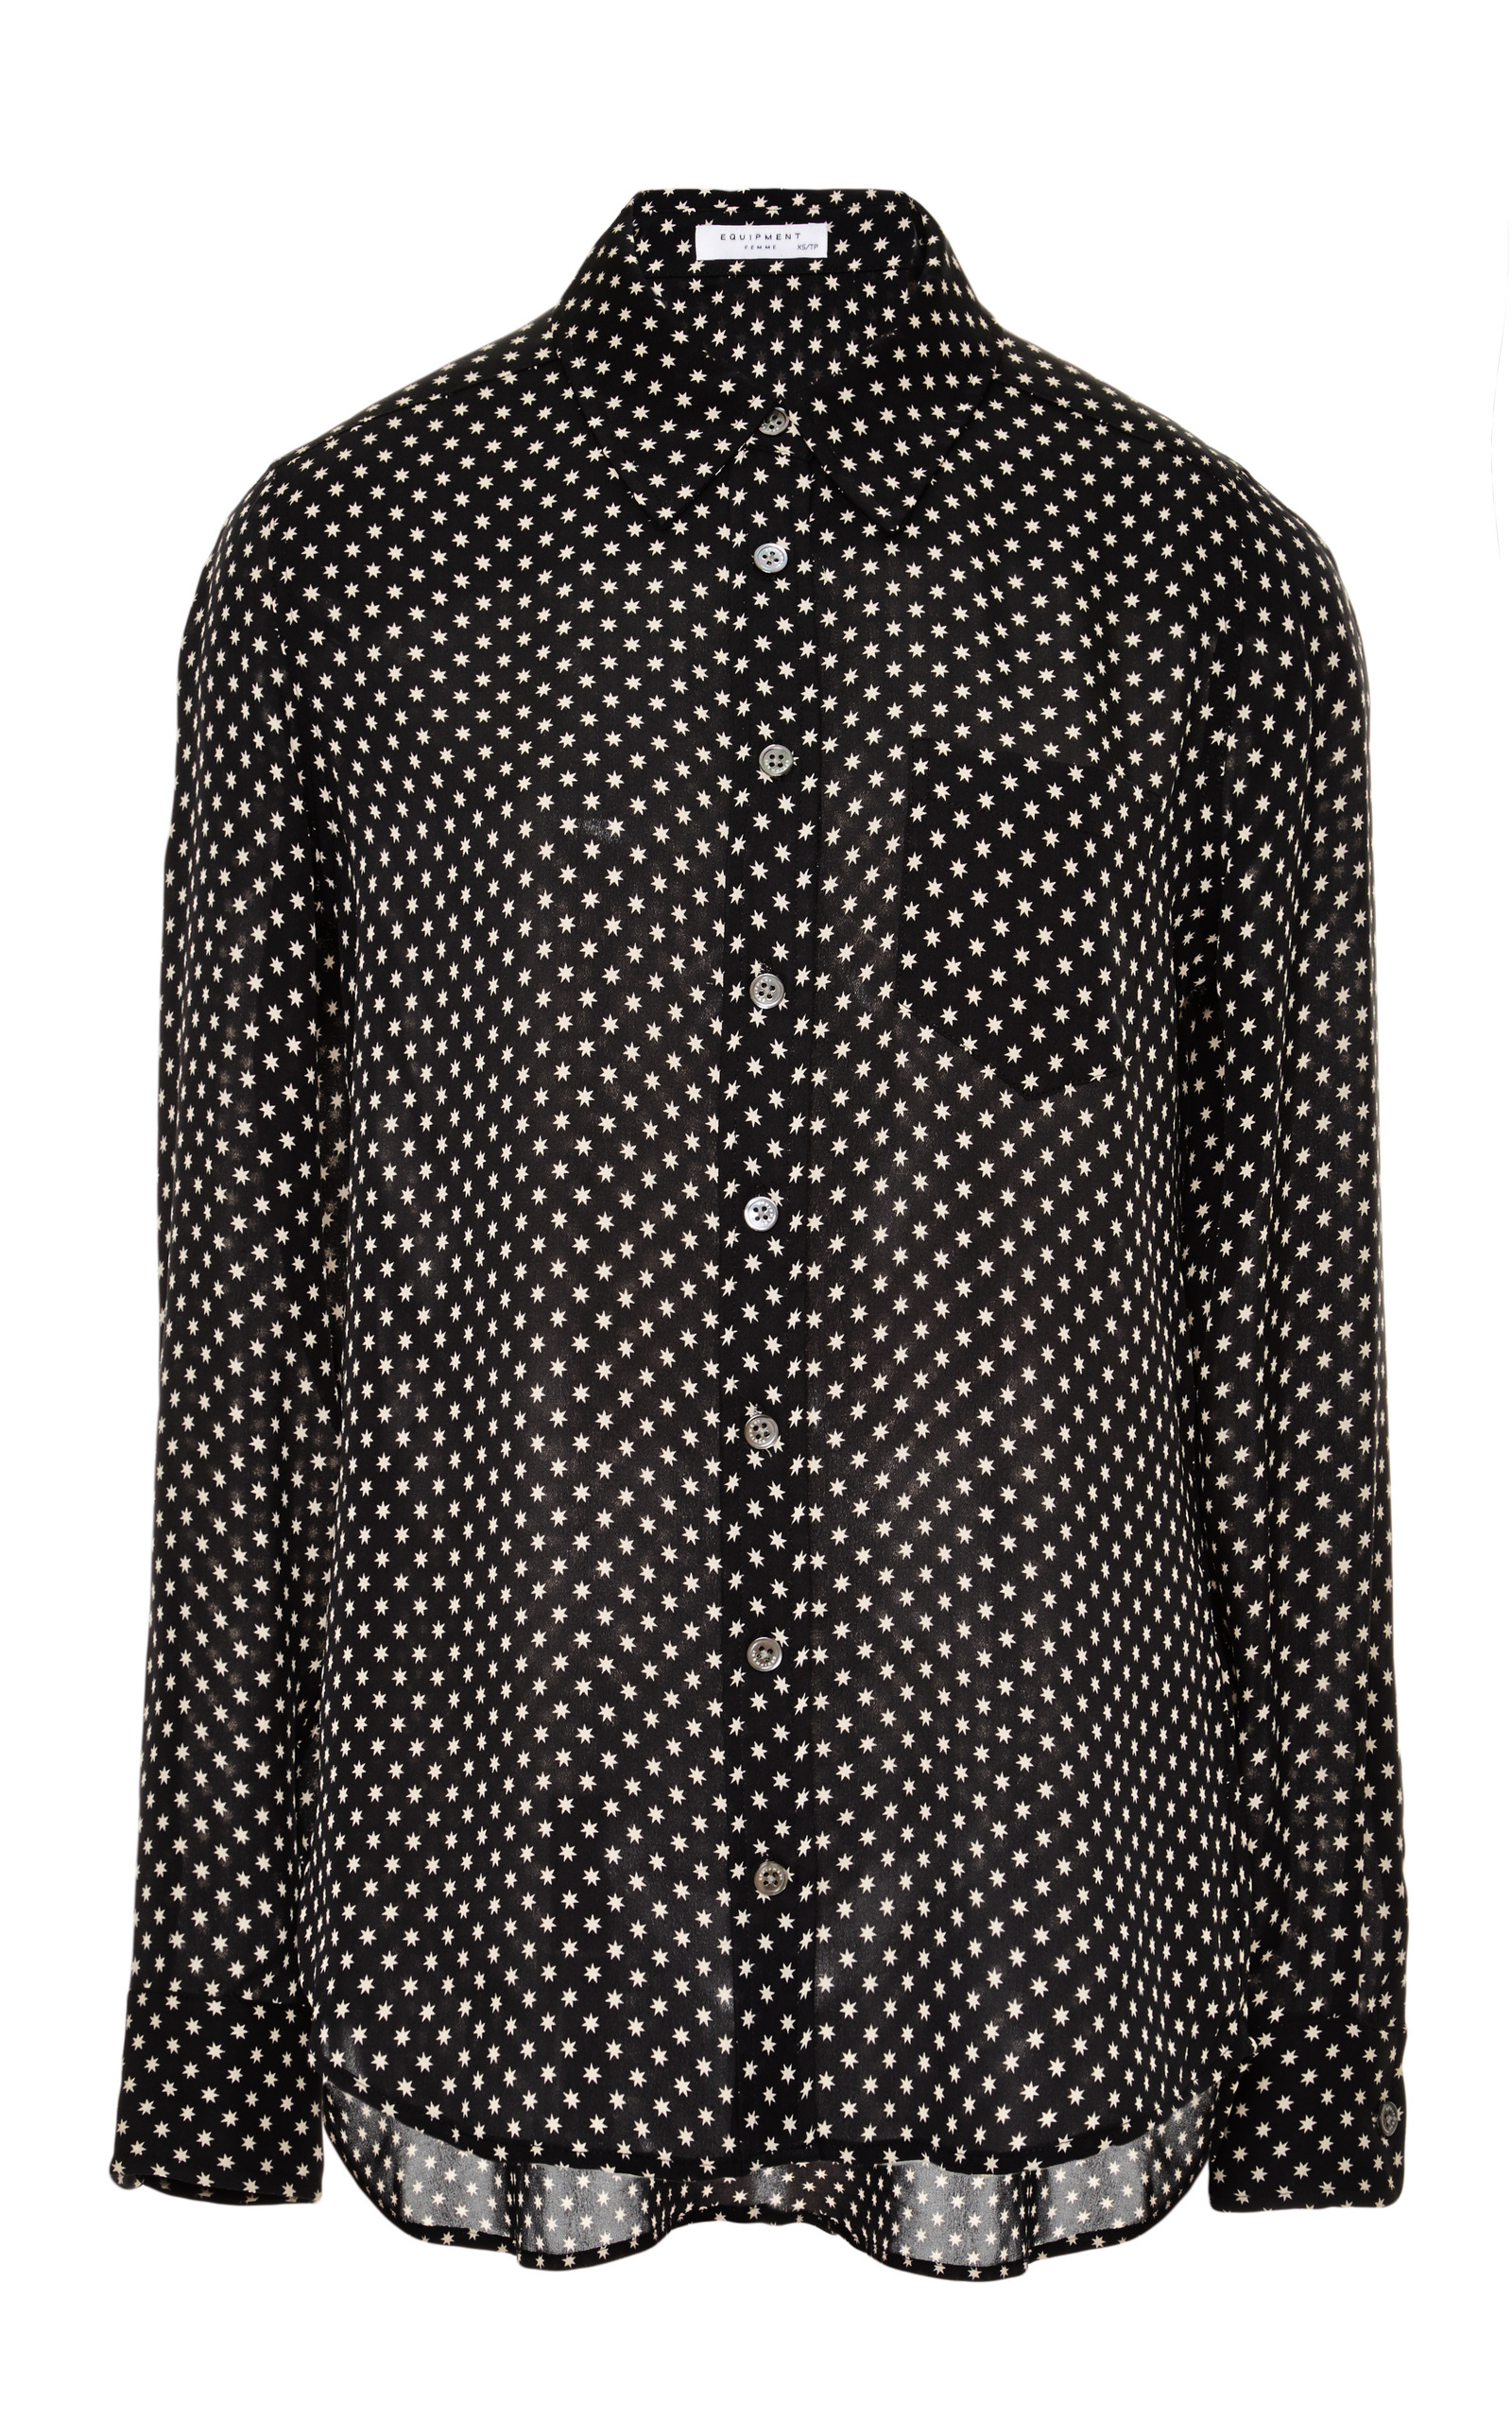 Lyst equipment brett star printed silk shirt in black for Equipment black silk shirt